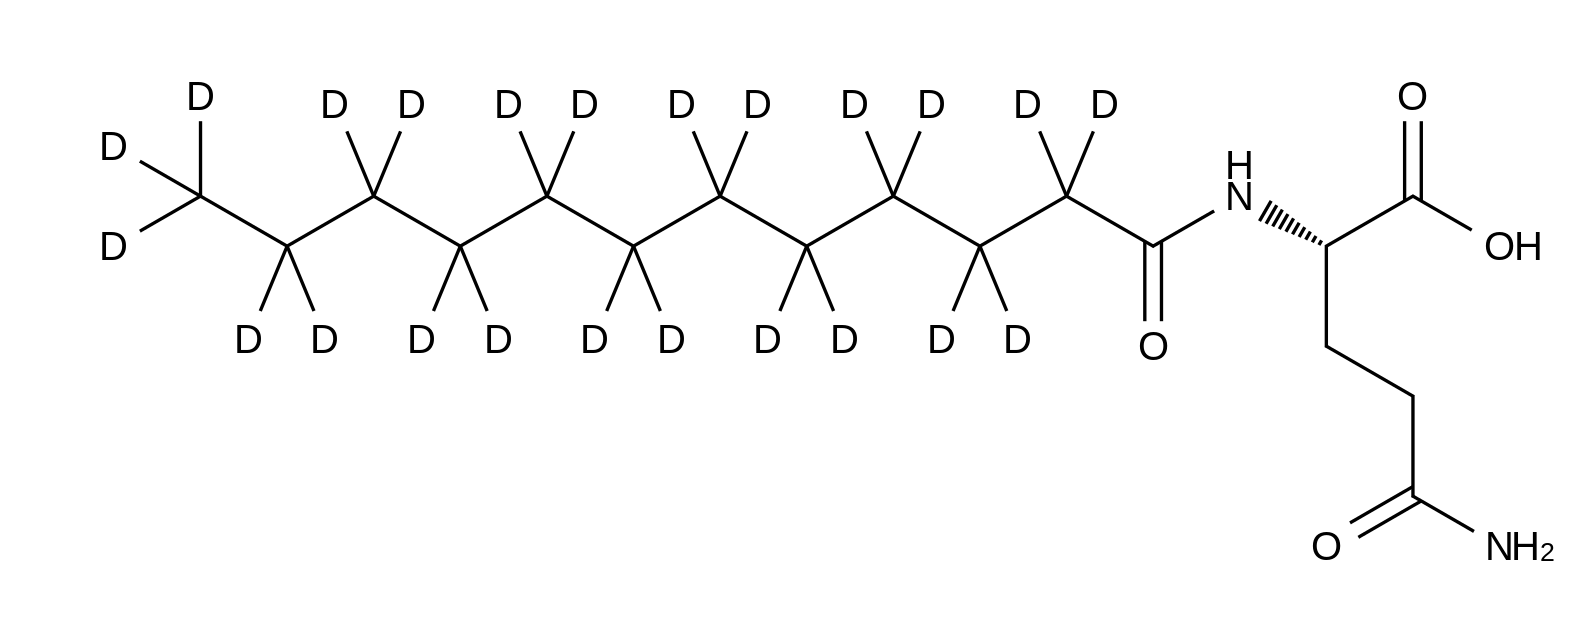 N2-Lauroyl-L-glutamine-d<sub>2</sub>3